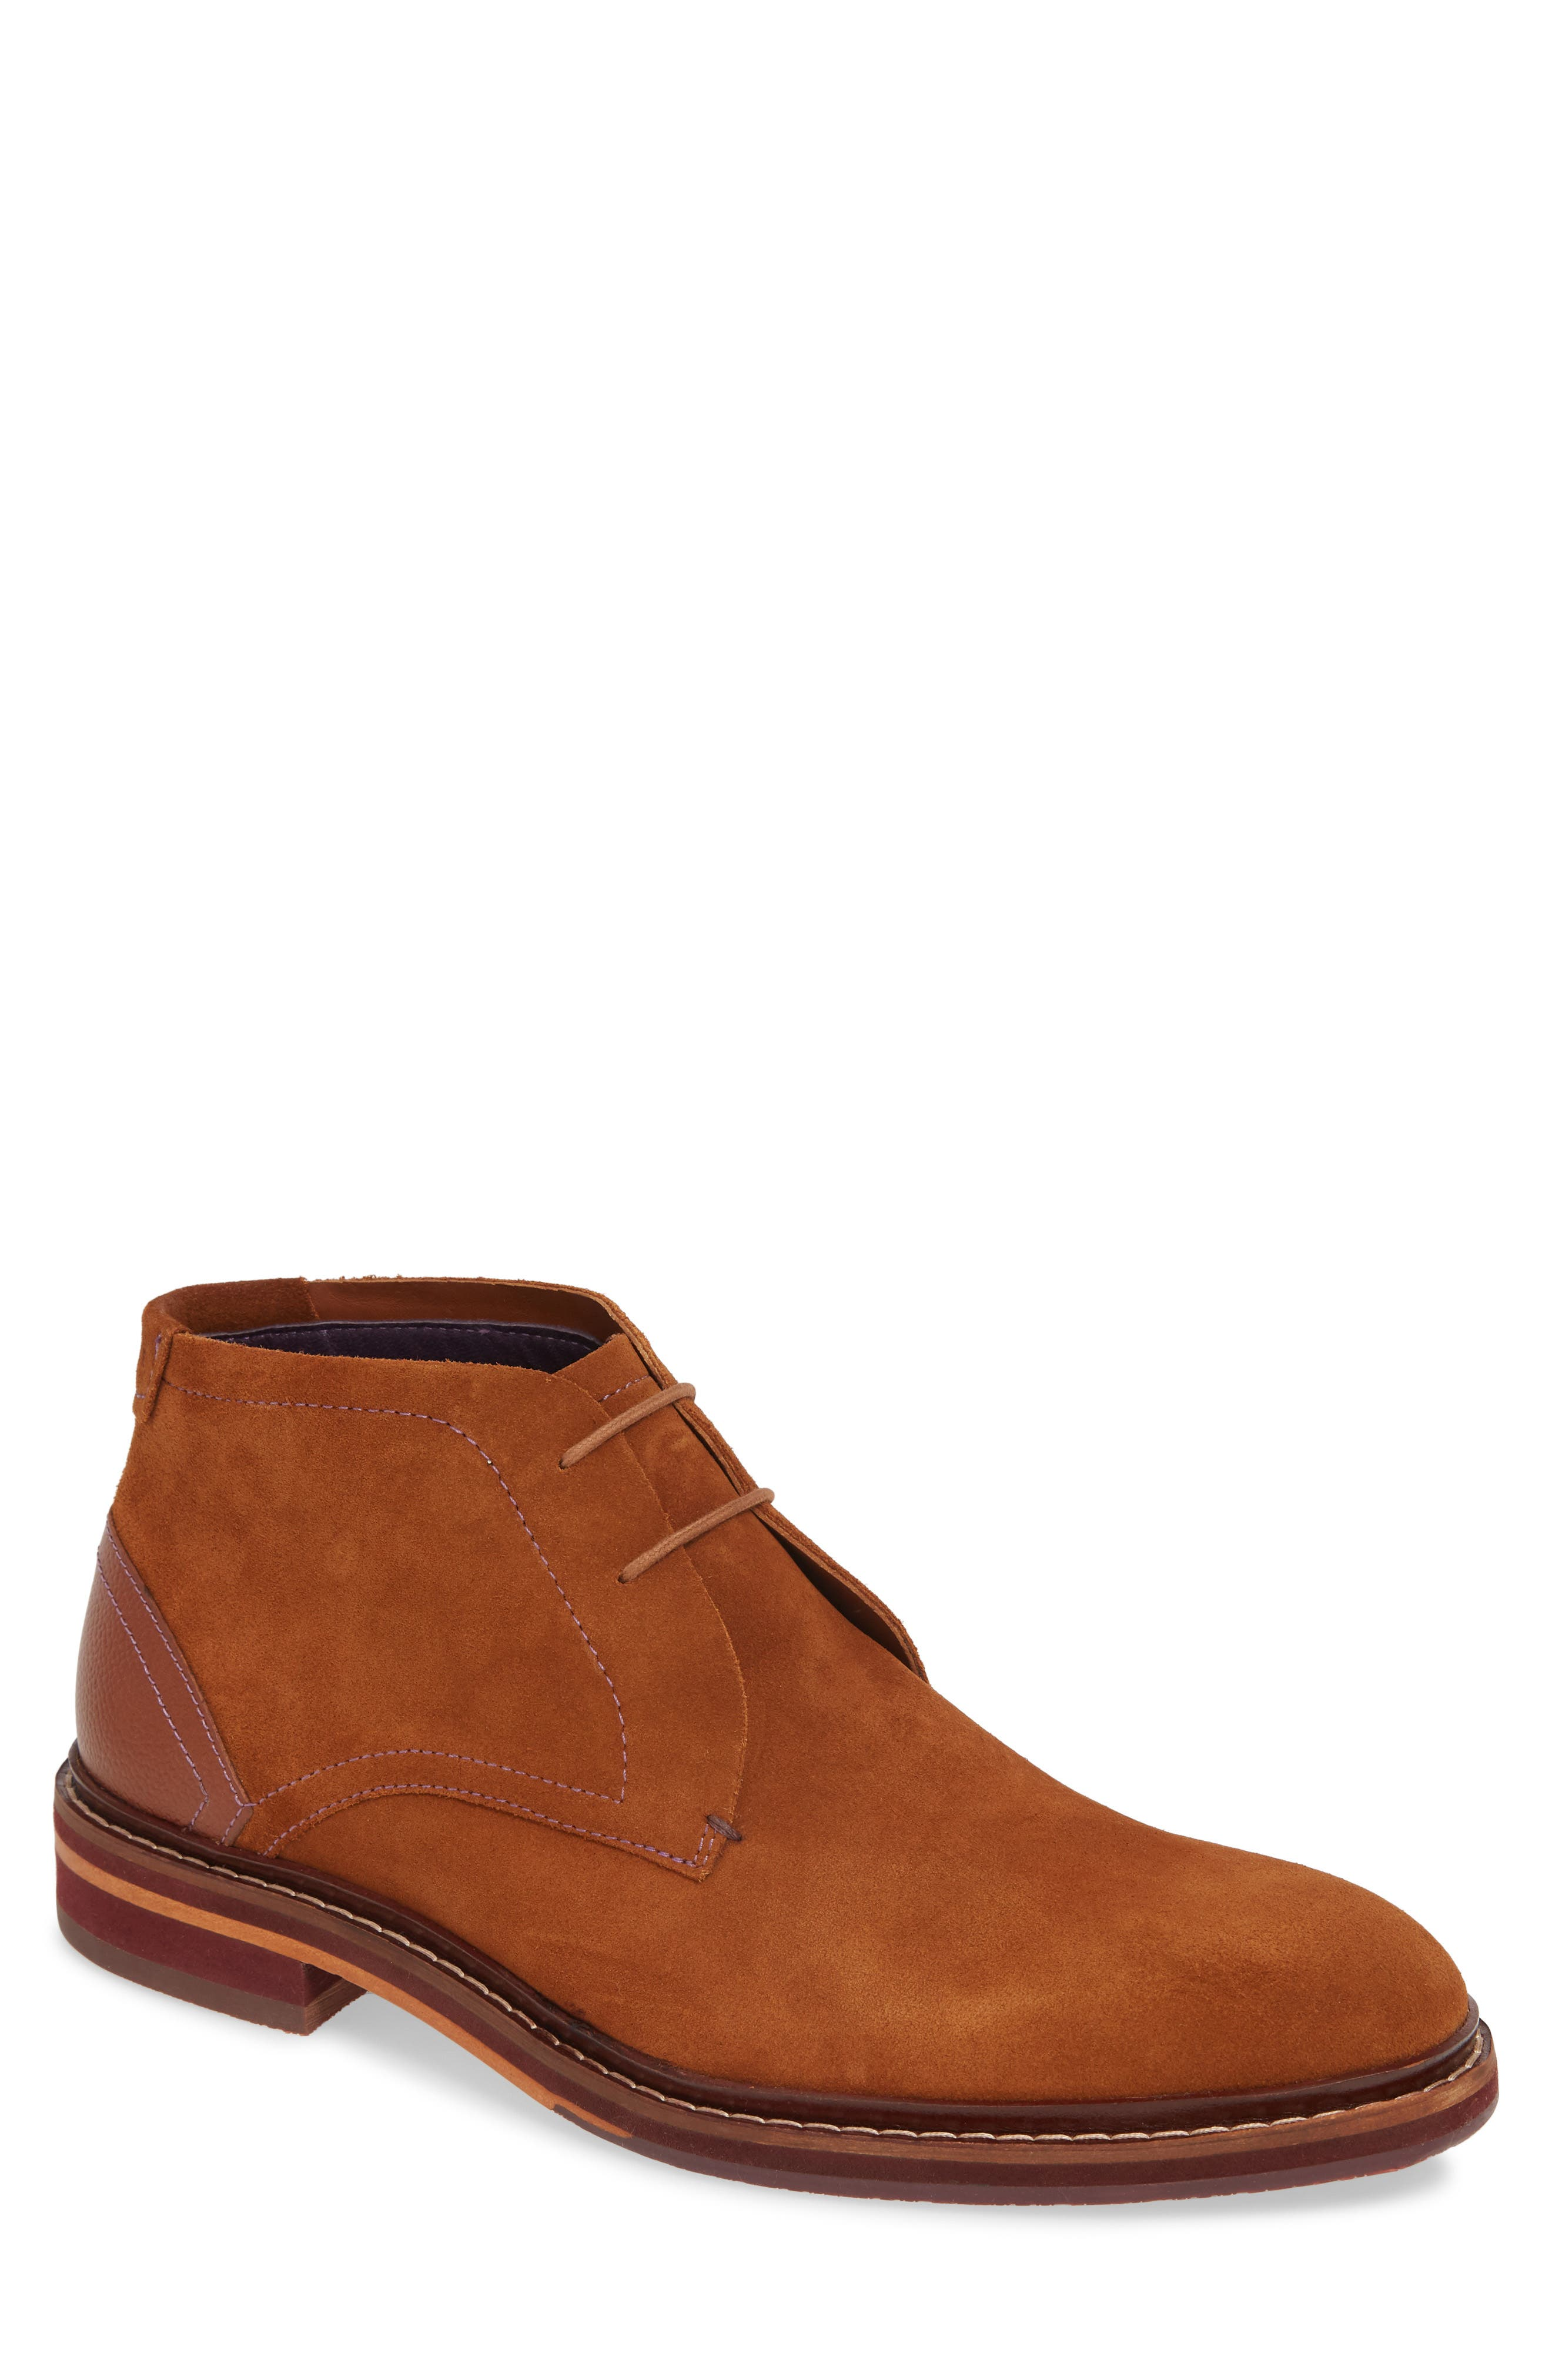 c09dca436c7c Mens Ted Baker London Boots